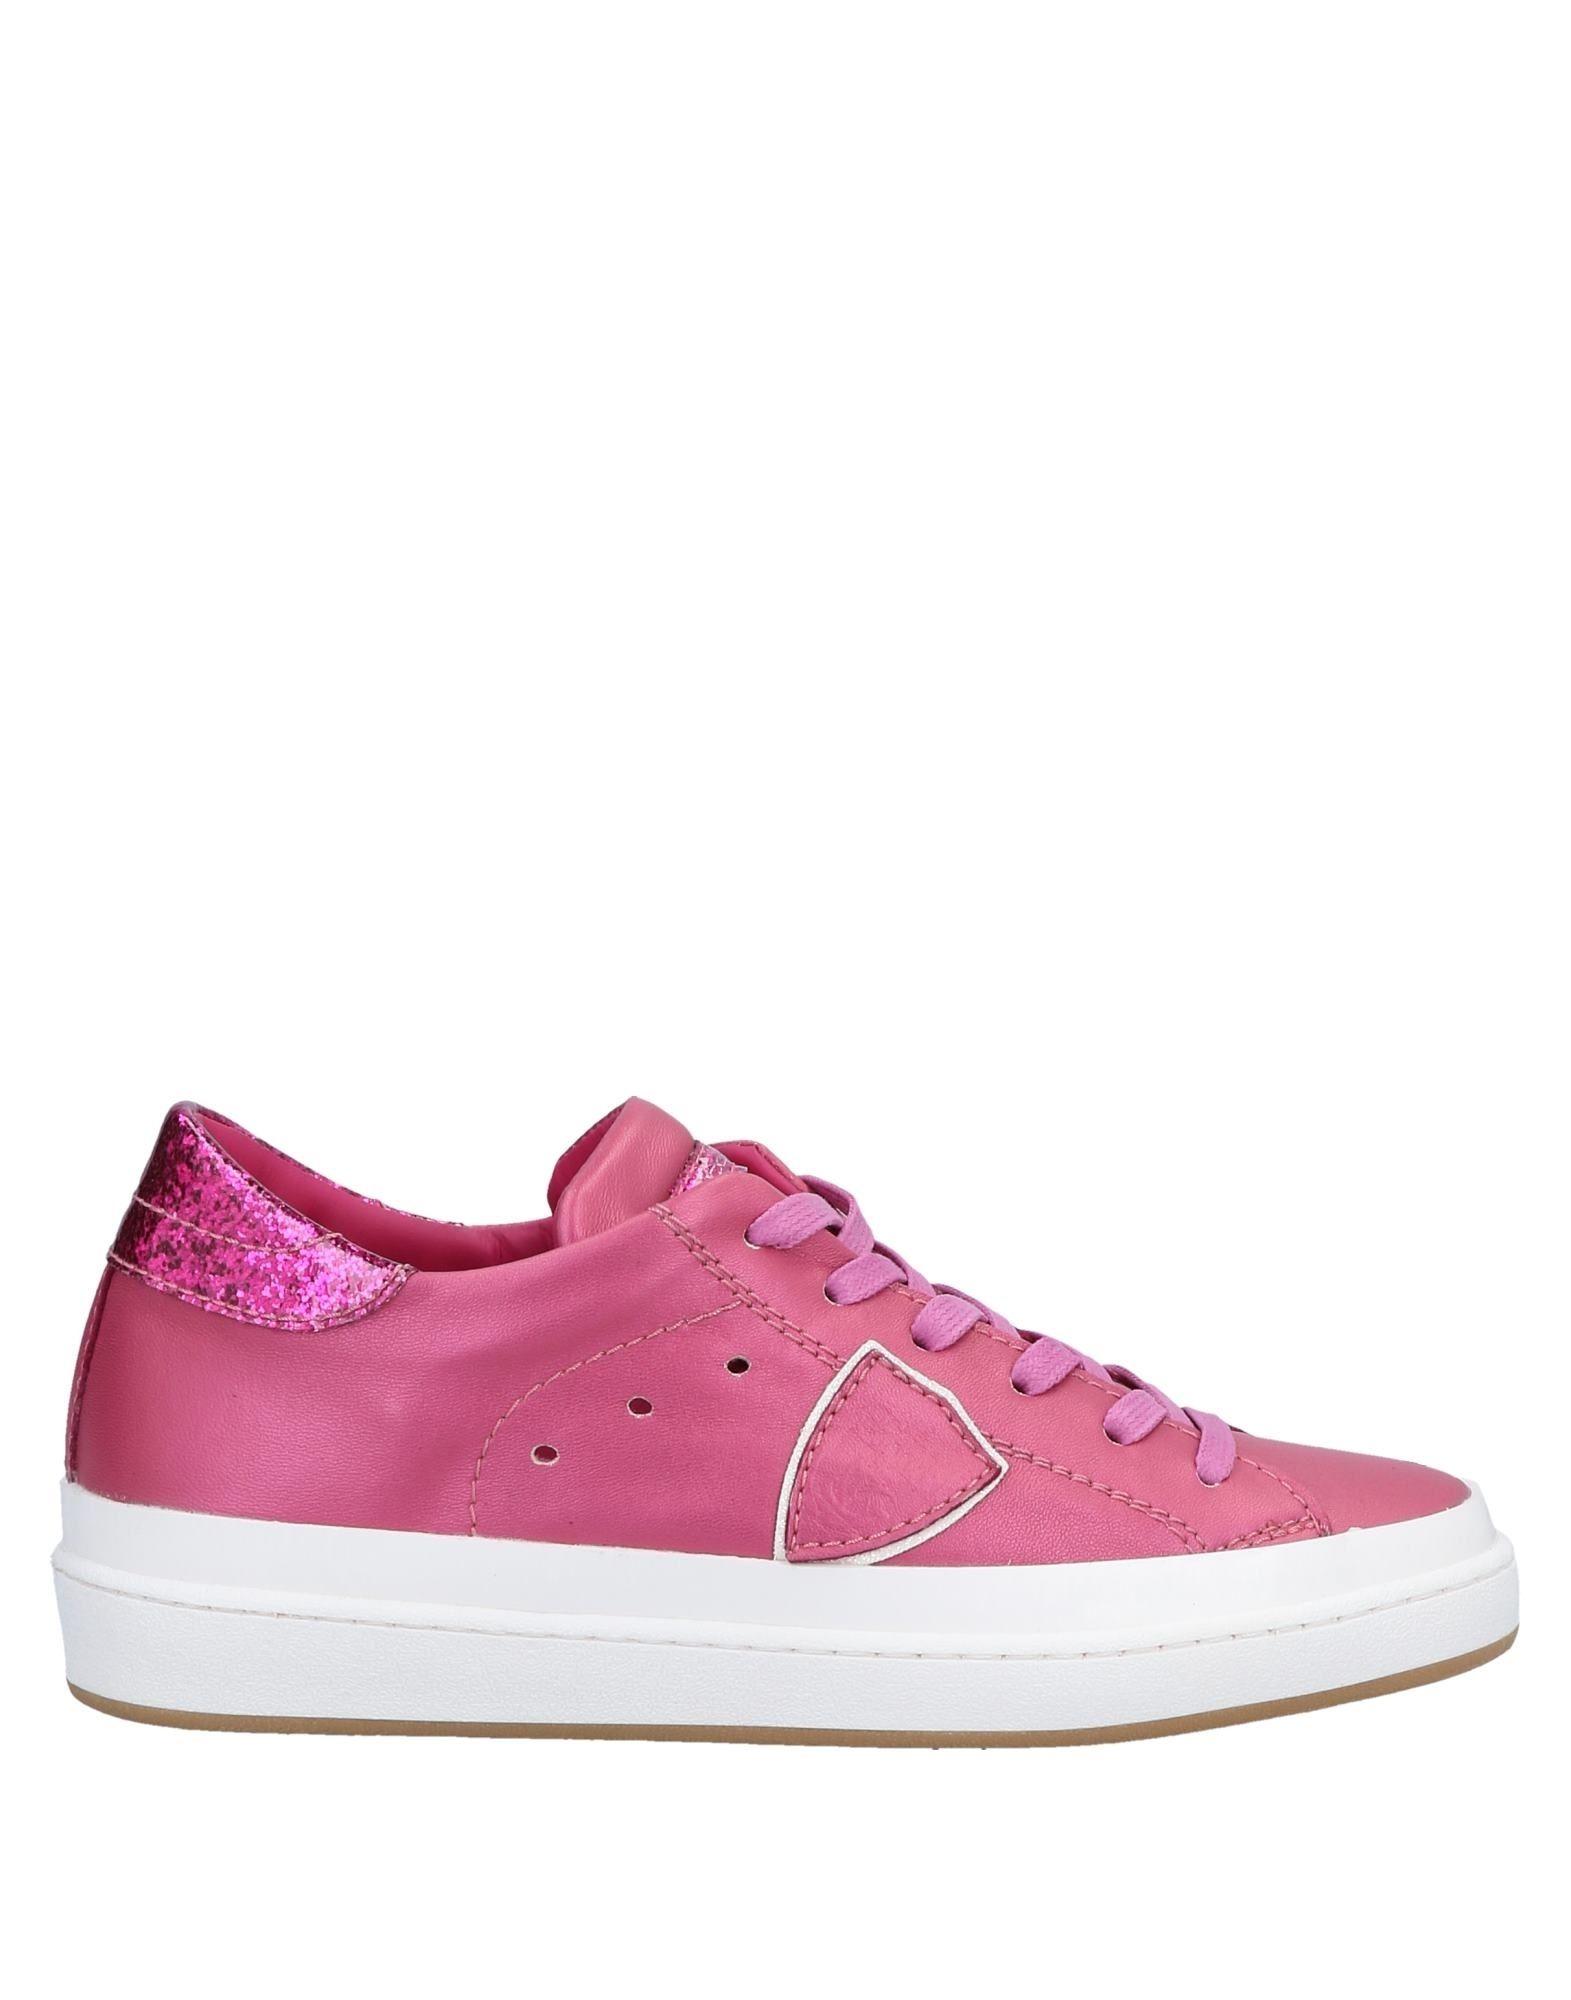 Philippe Philippe Model Sneakers - Women Philippe Philippe Model Sneakers online on  Australia - 11565613JE 2466c4